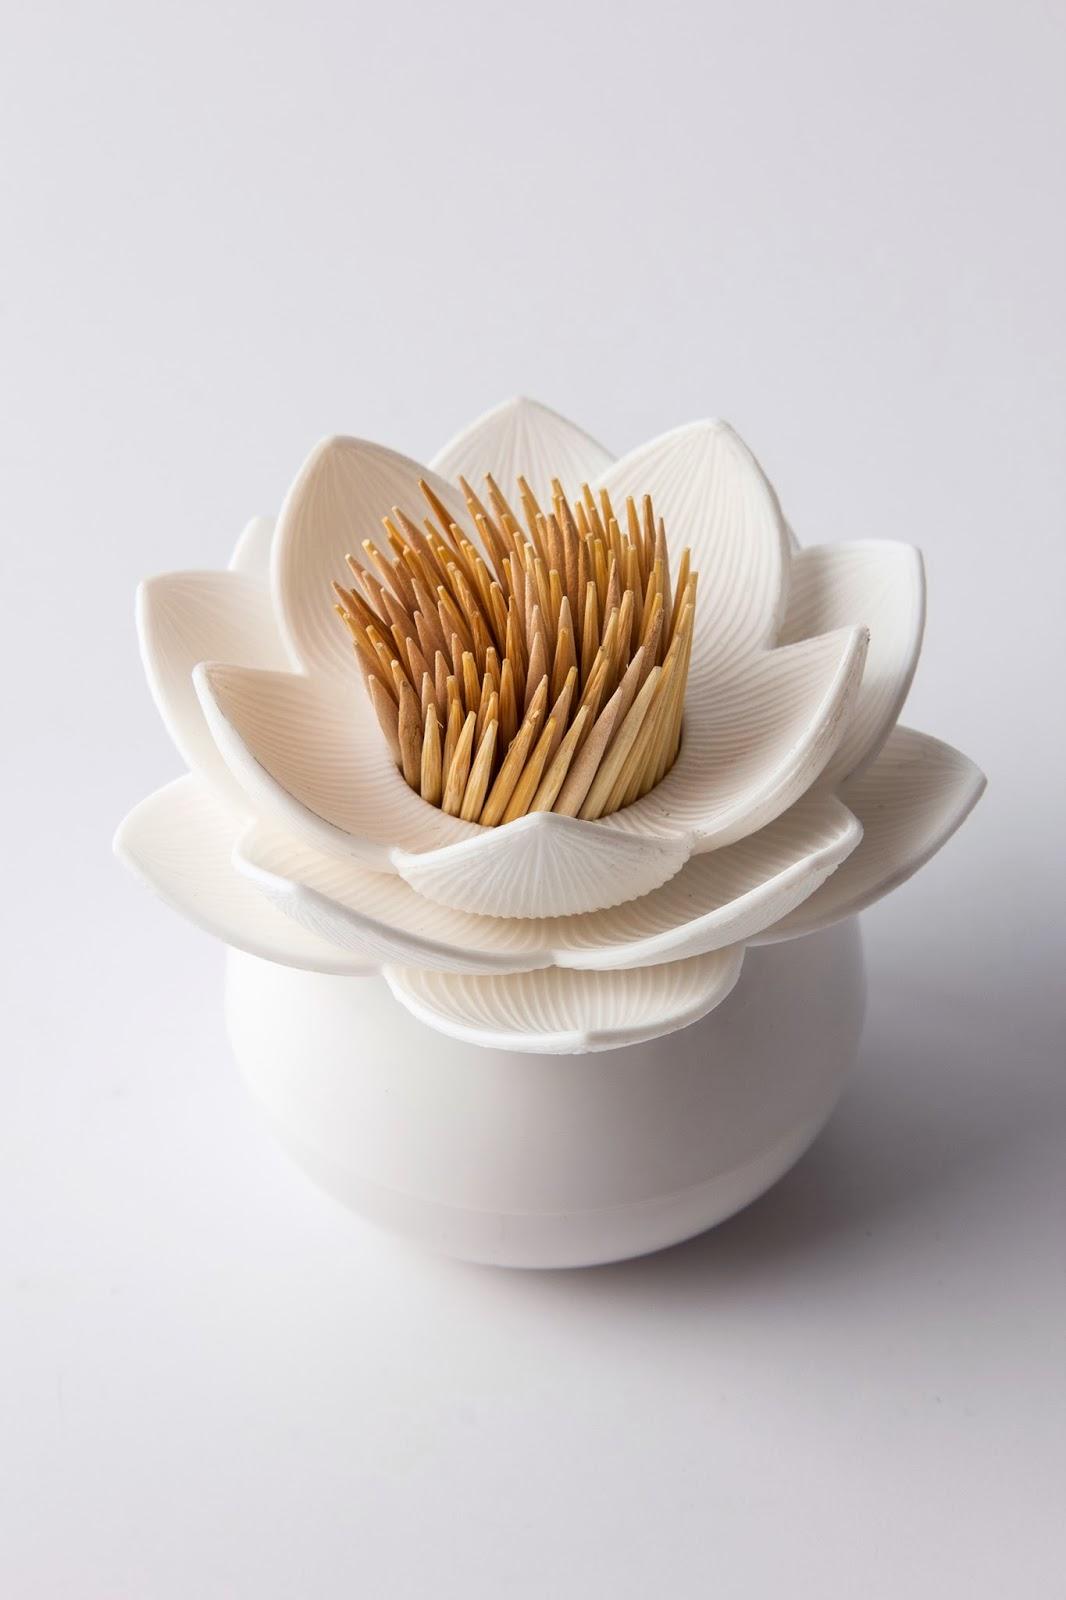 http://www.heartbeats.fr/diner-aperitif-cuisine-deco-design-idee-cadeau/260-lotus-cure-dents-qualy.html